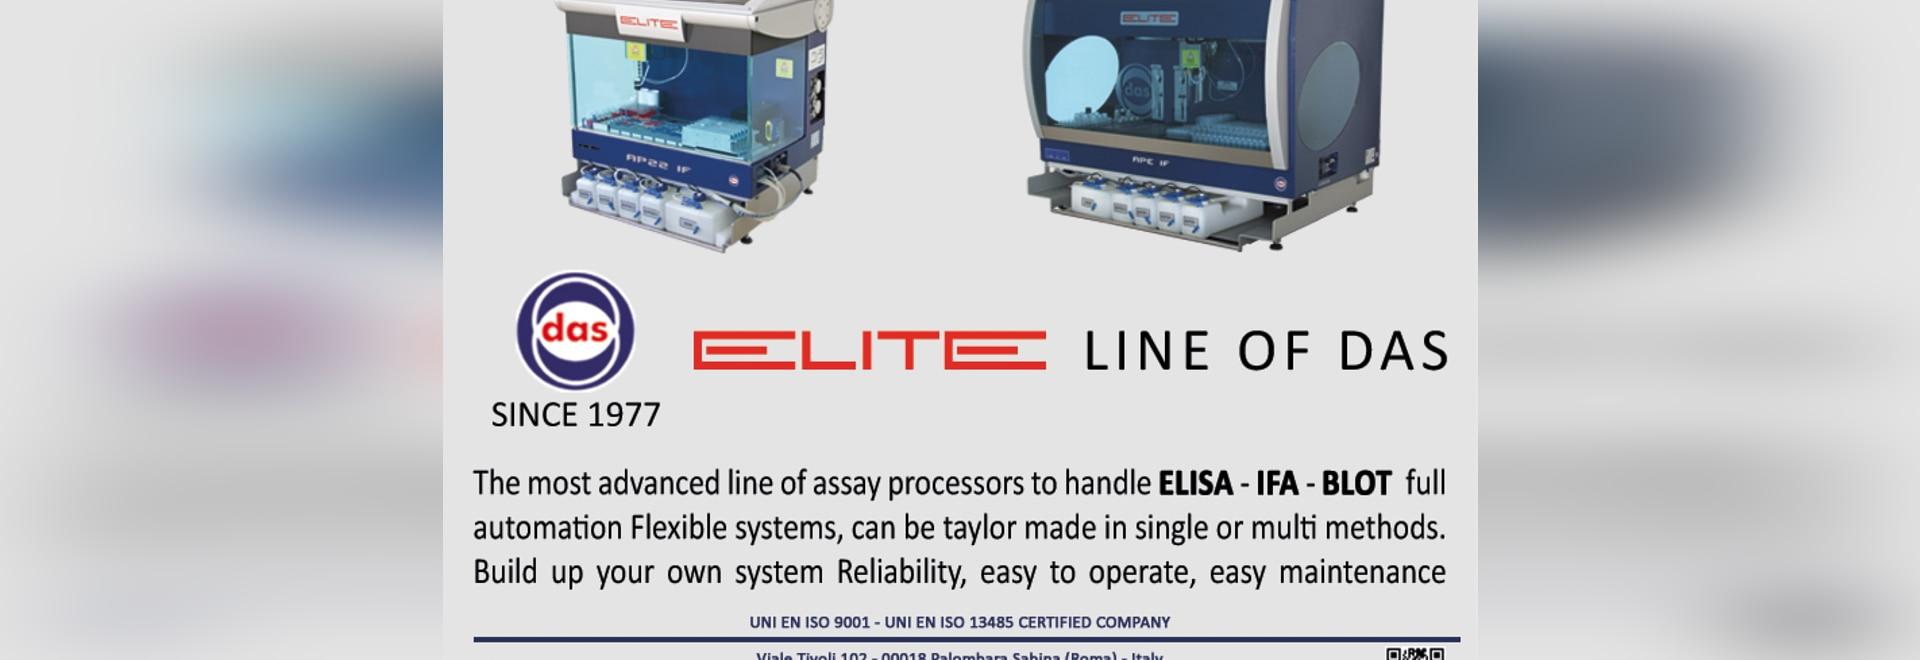 ELITE LINE of DAS